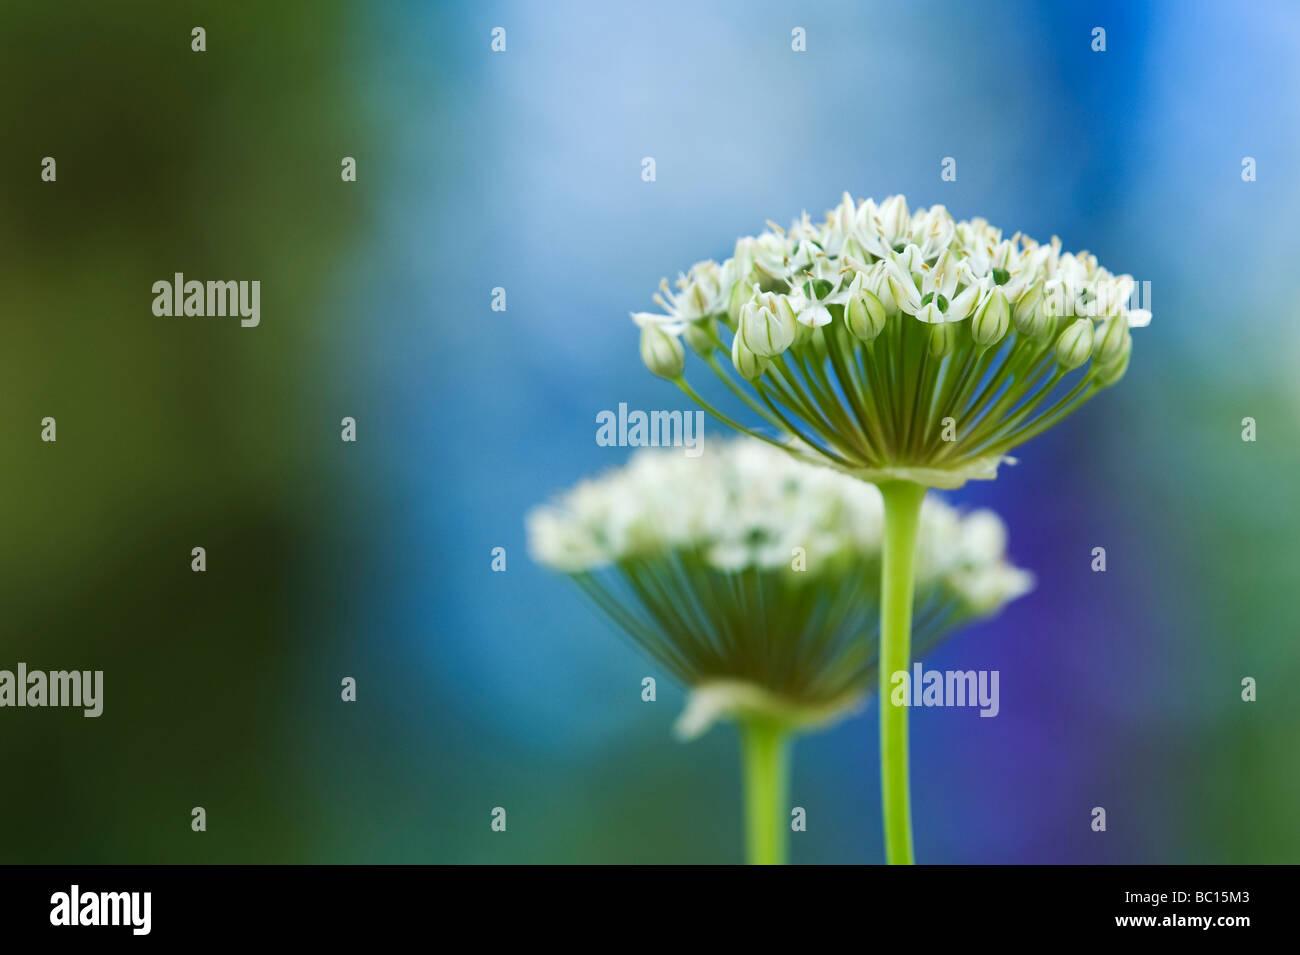 L'allium nigrum. Oignon ornemental / noir fleurs d'ail Photo Stock